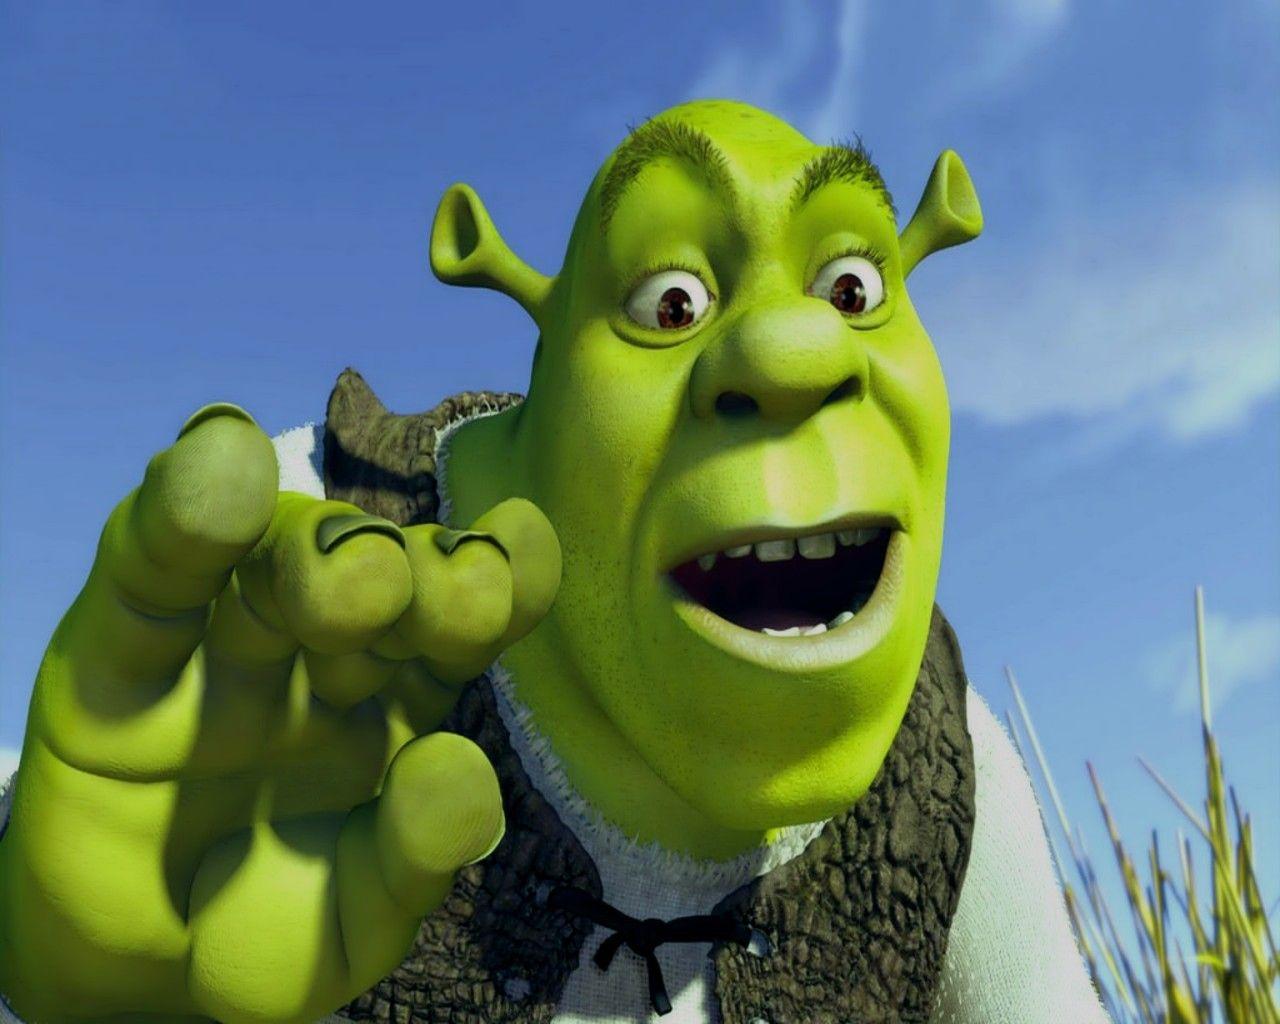 ☺iphone ios 7 wallpaper tumblr for ipad | Dessin animé, Films pour enfants, Shrek